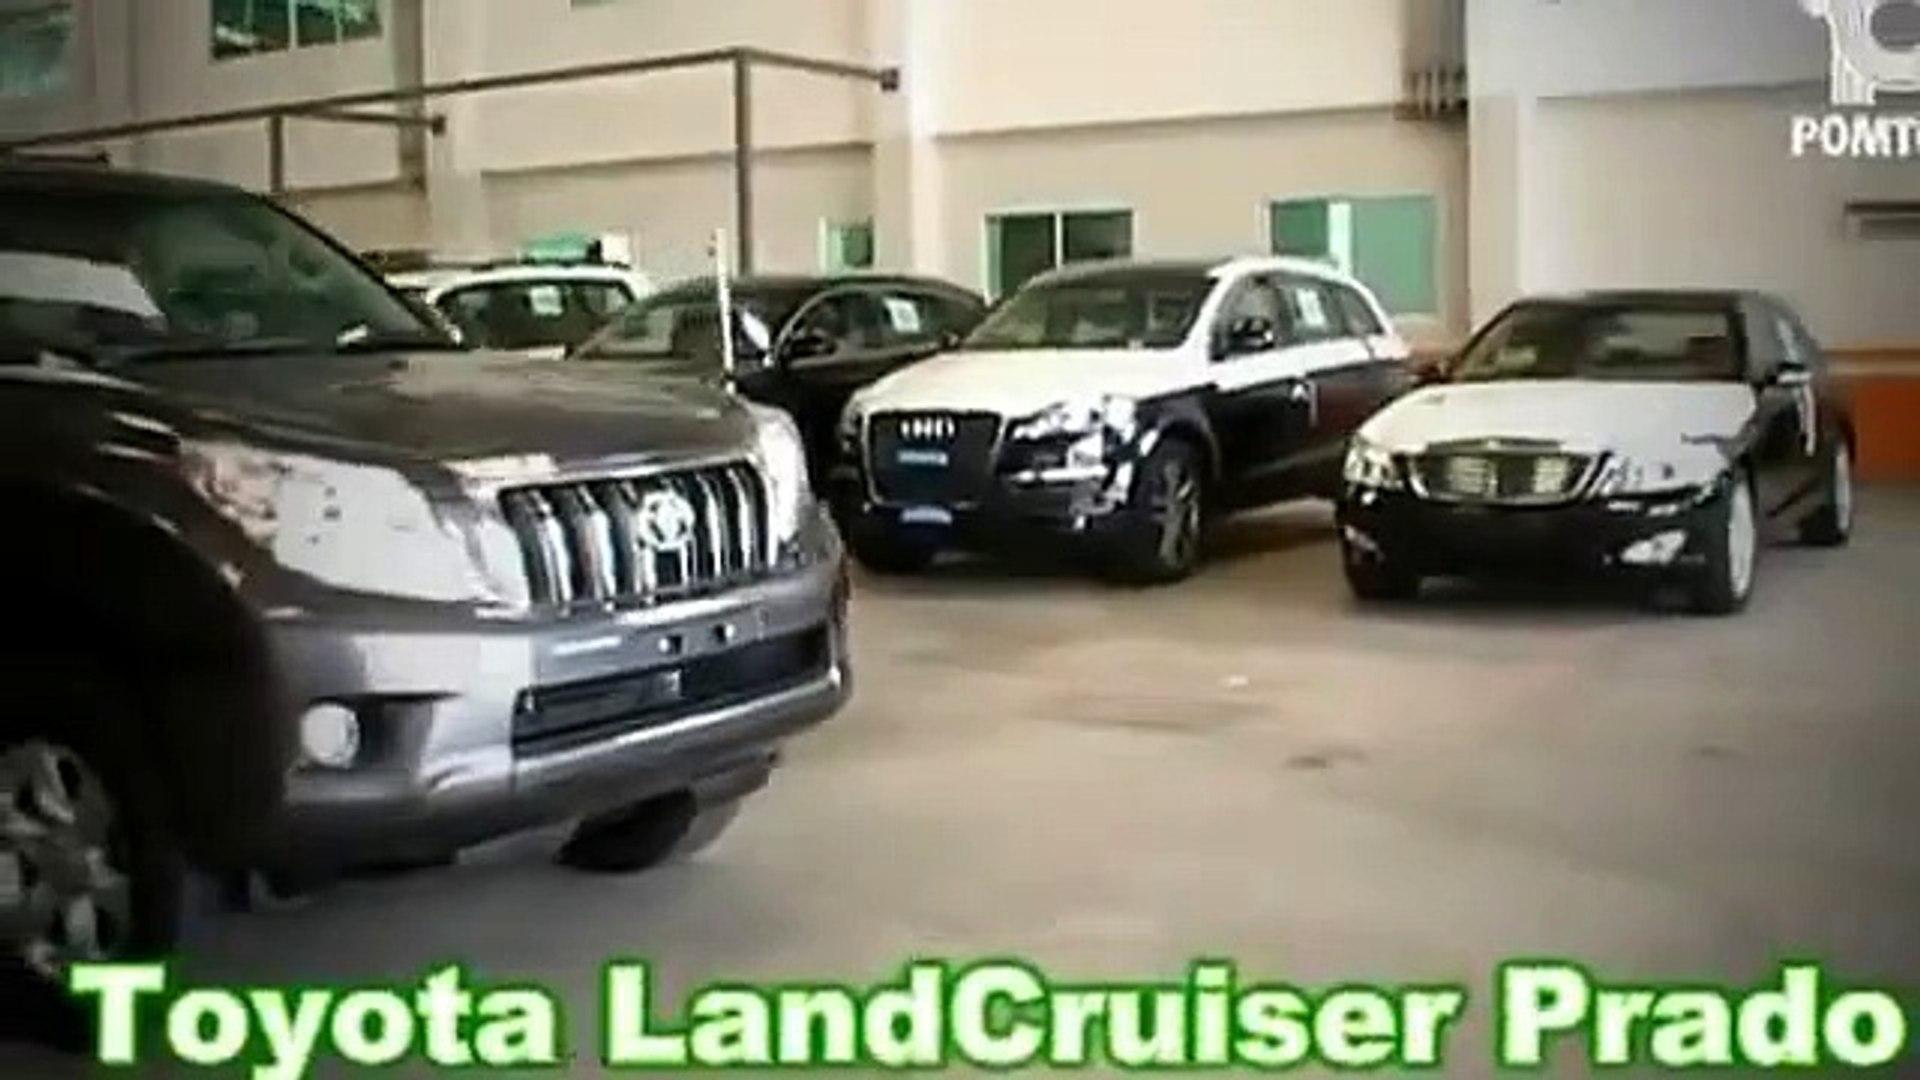 Toyota Land Cruiser Prado TXL 2014,Toyota Prado 2014,Prado 2014,Prado TXL 2014,TOYOTA THANH XUÂN